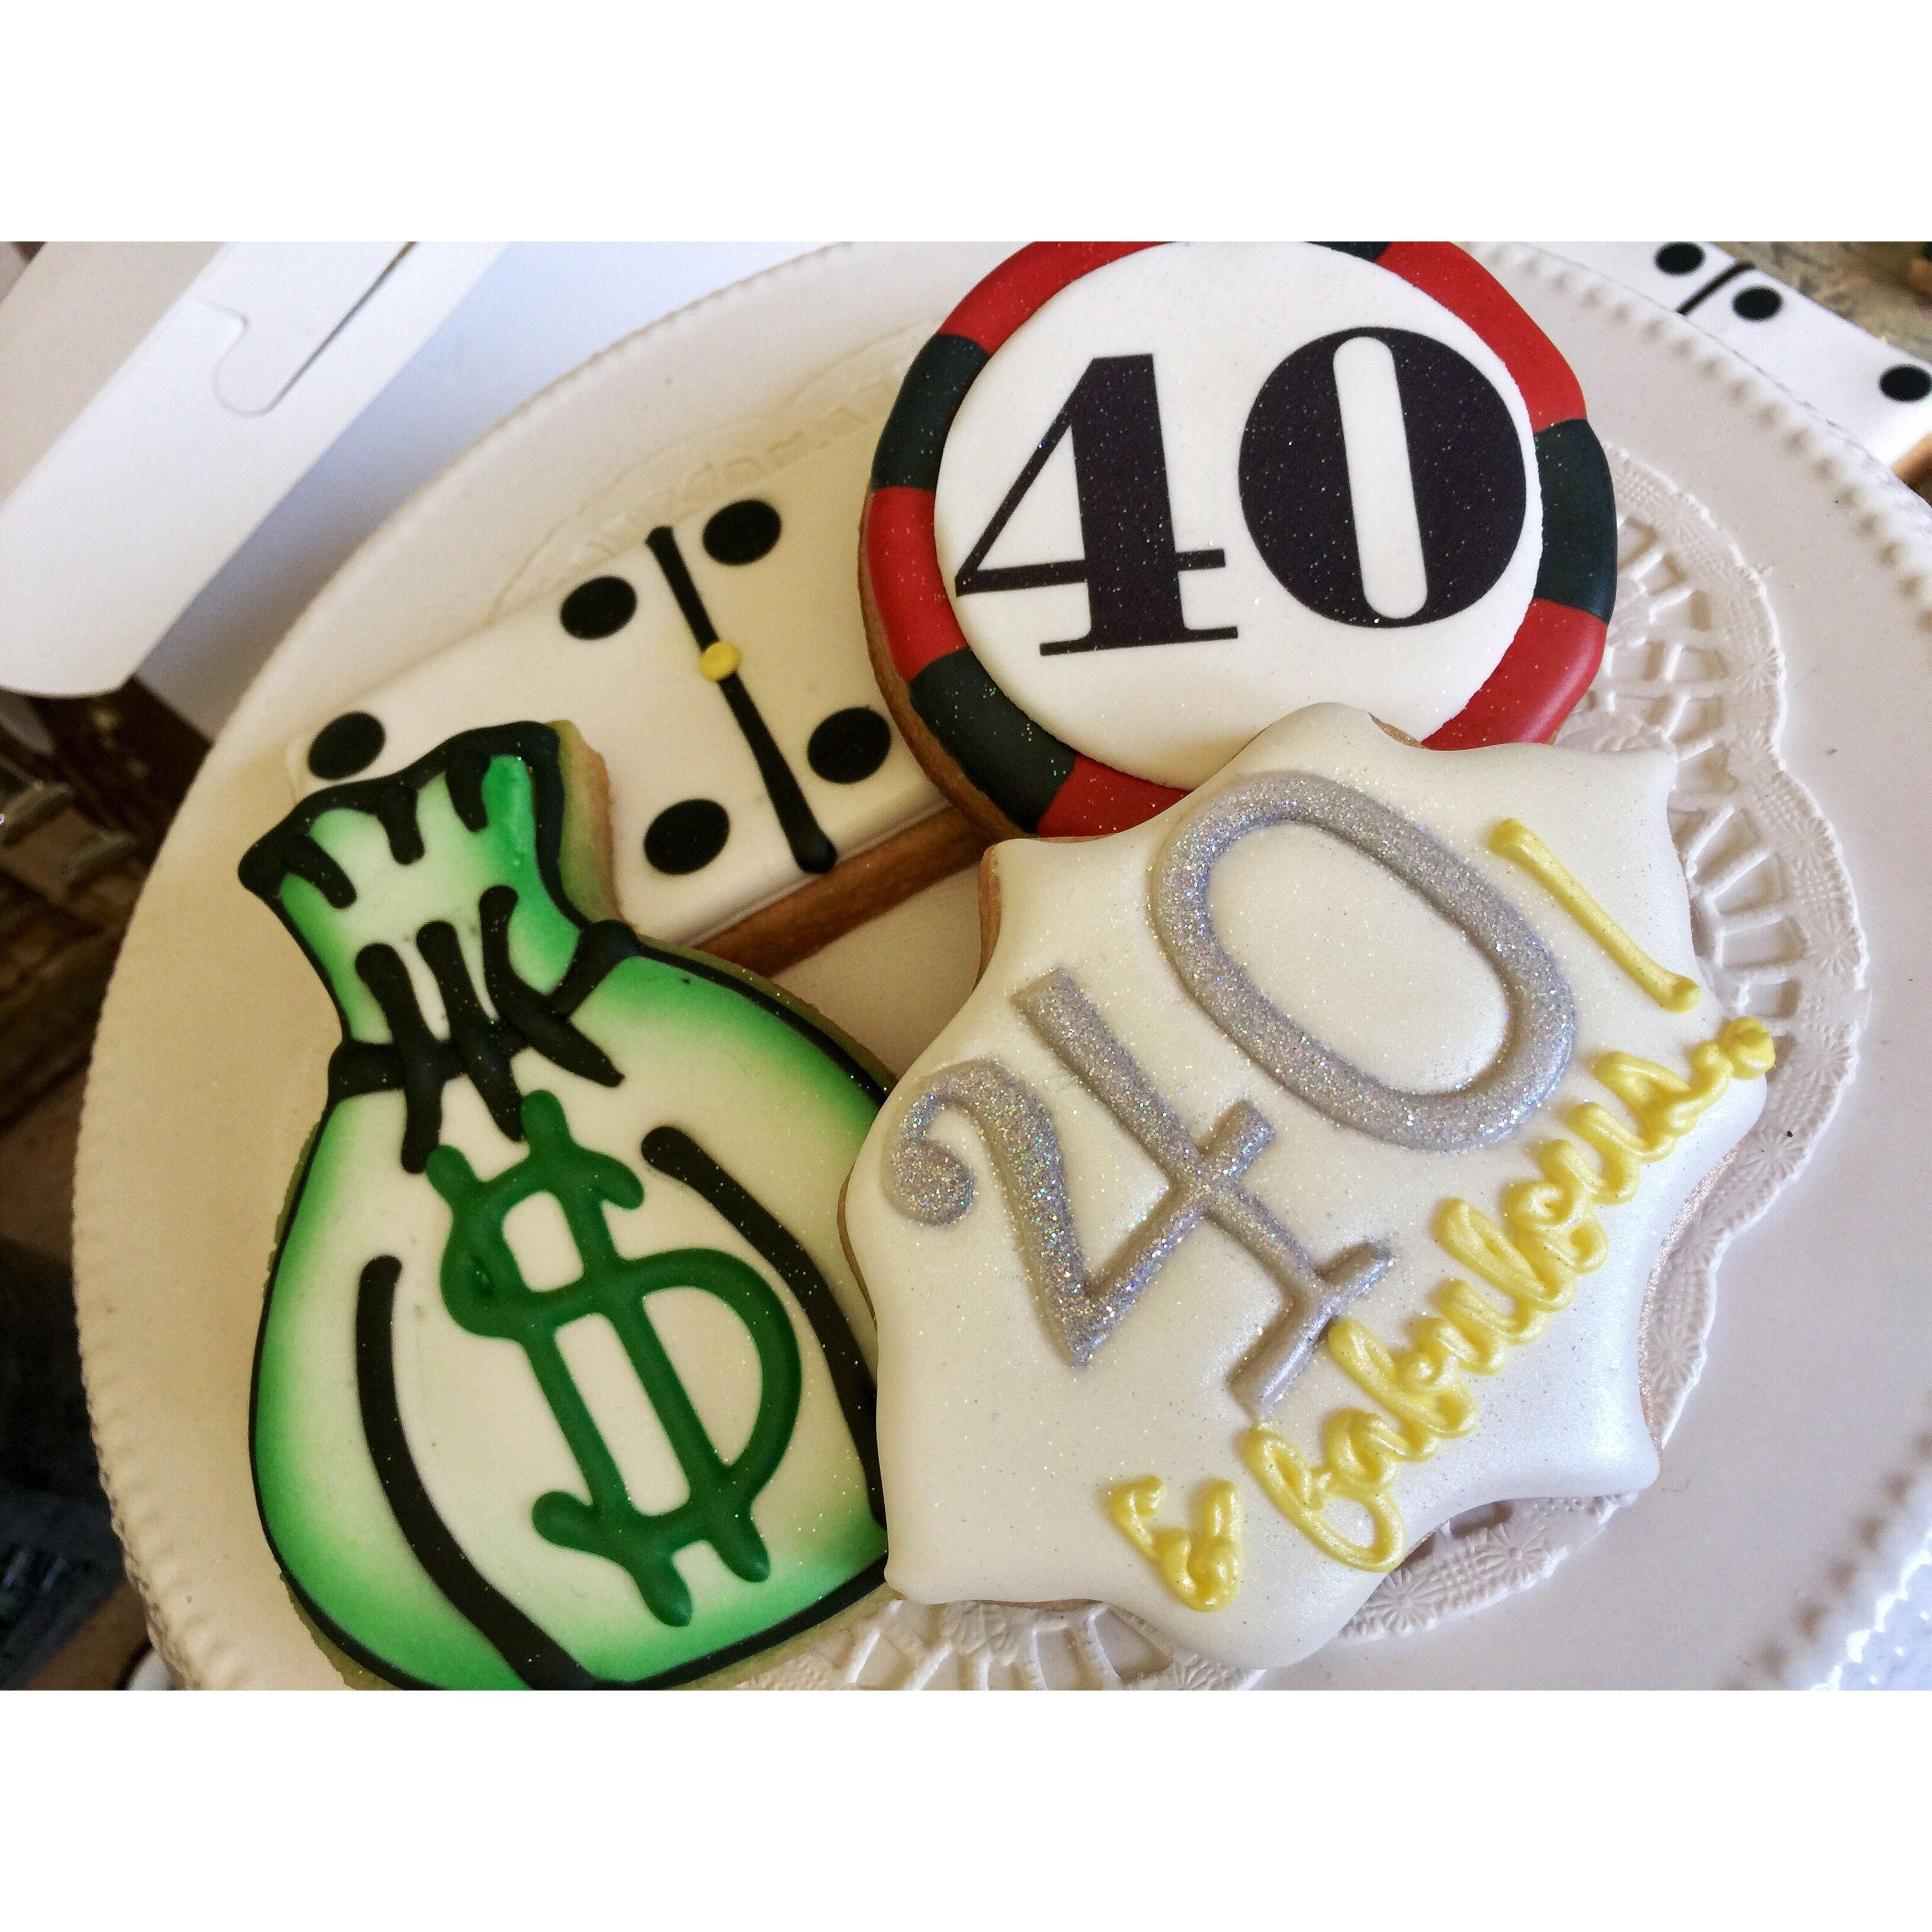 Poker chip cookies money bag cookies 40 &a fabulous